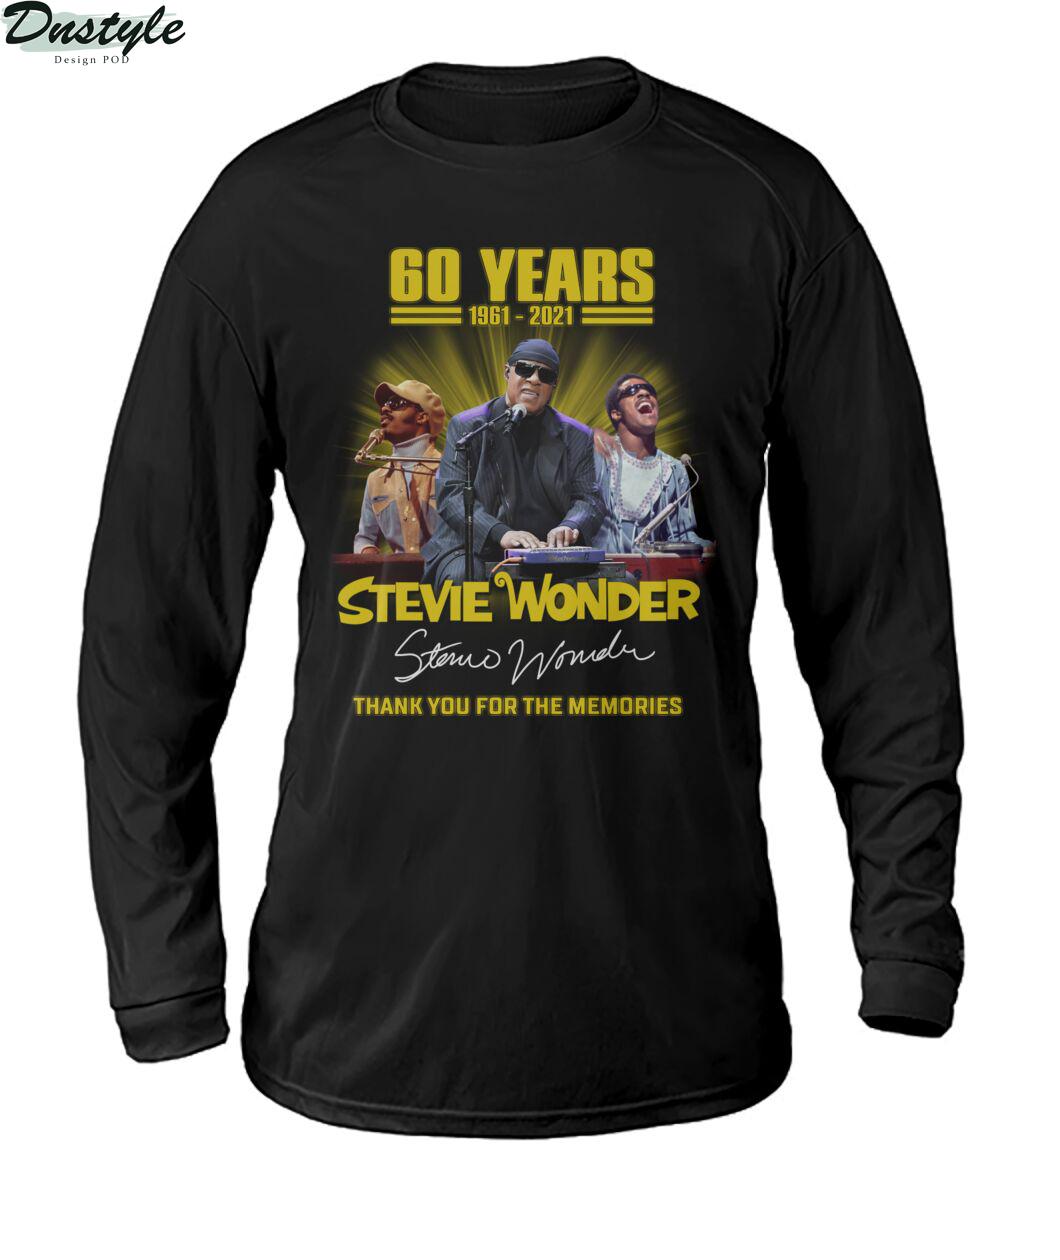 60 years Stevie Wonder signature thank you for the memories sweatshirt